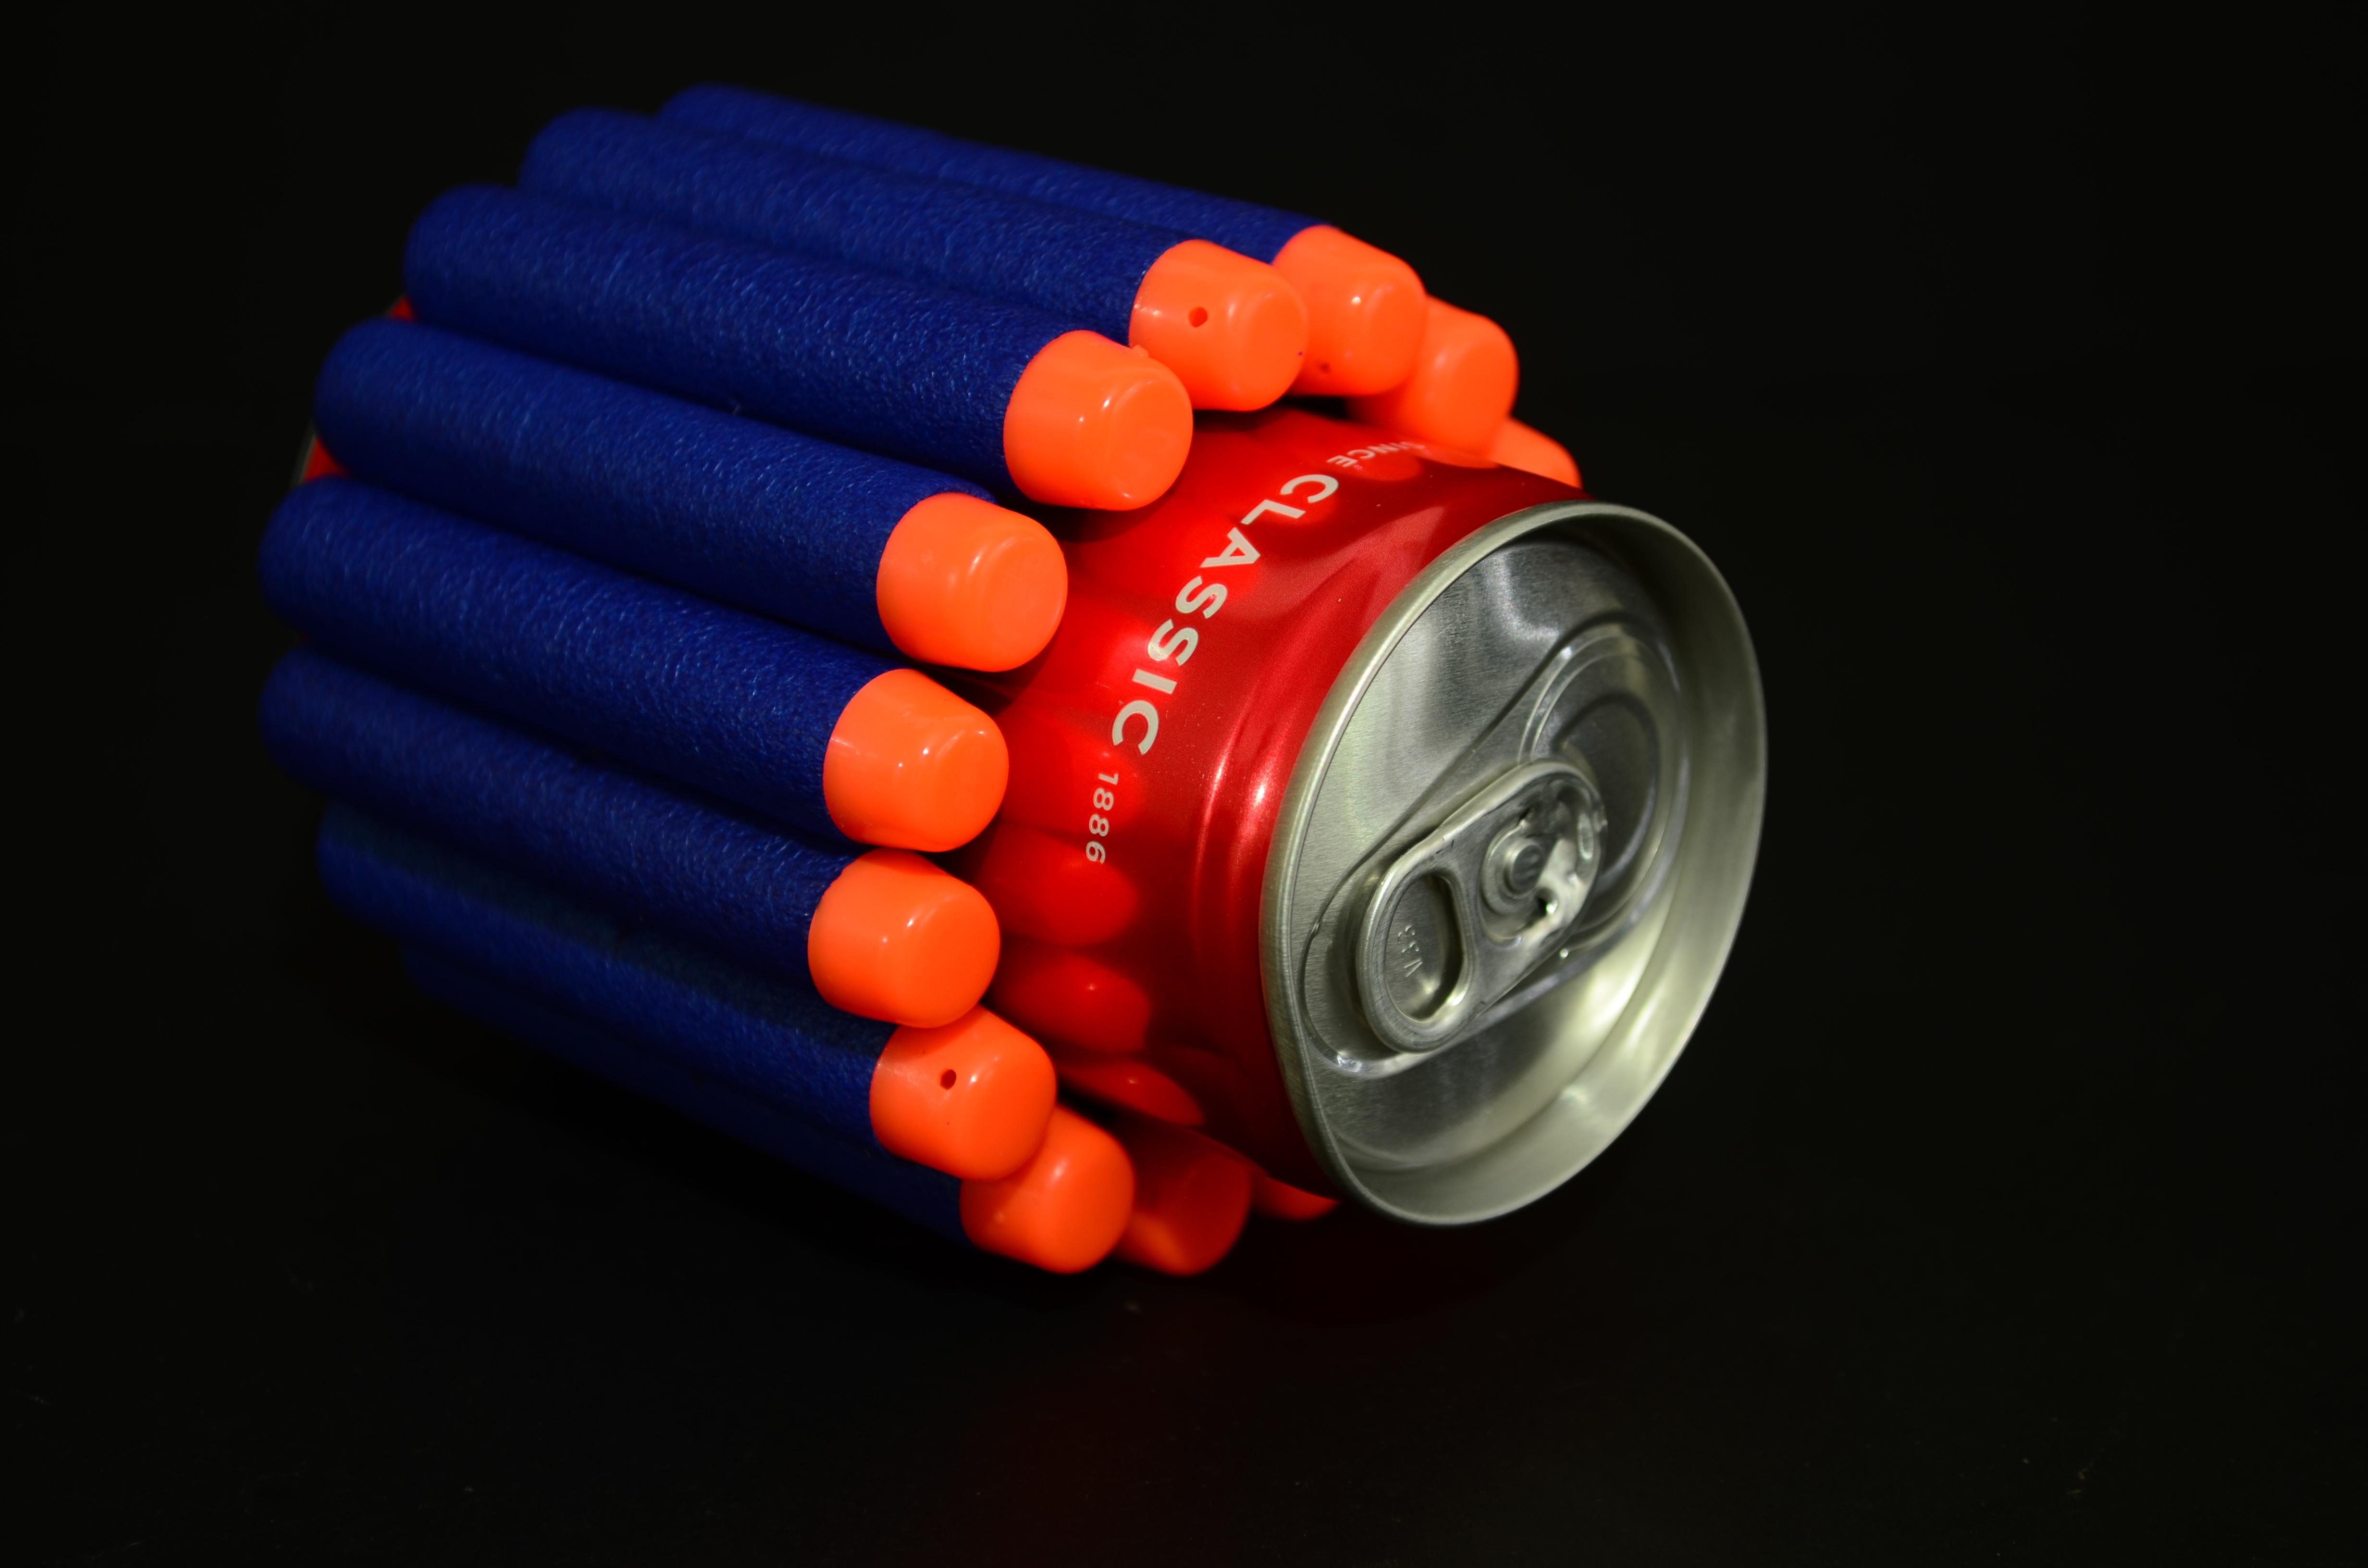 Picture of Nerf Drink Holder & Cooler